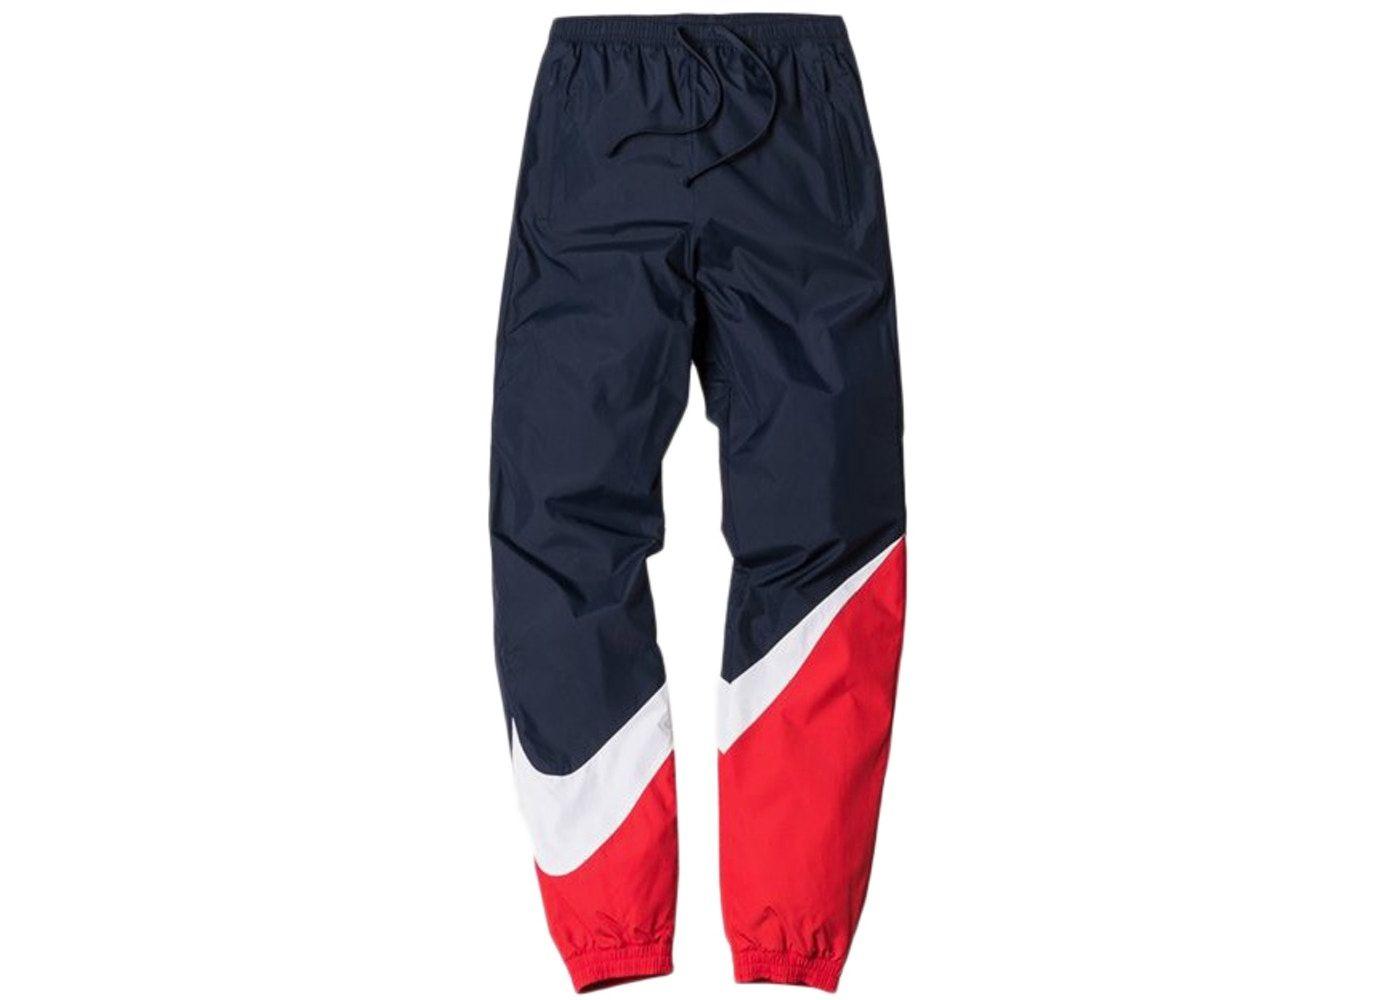 Kith x Nike Big Swoosh Pants Navy